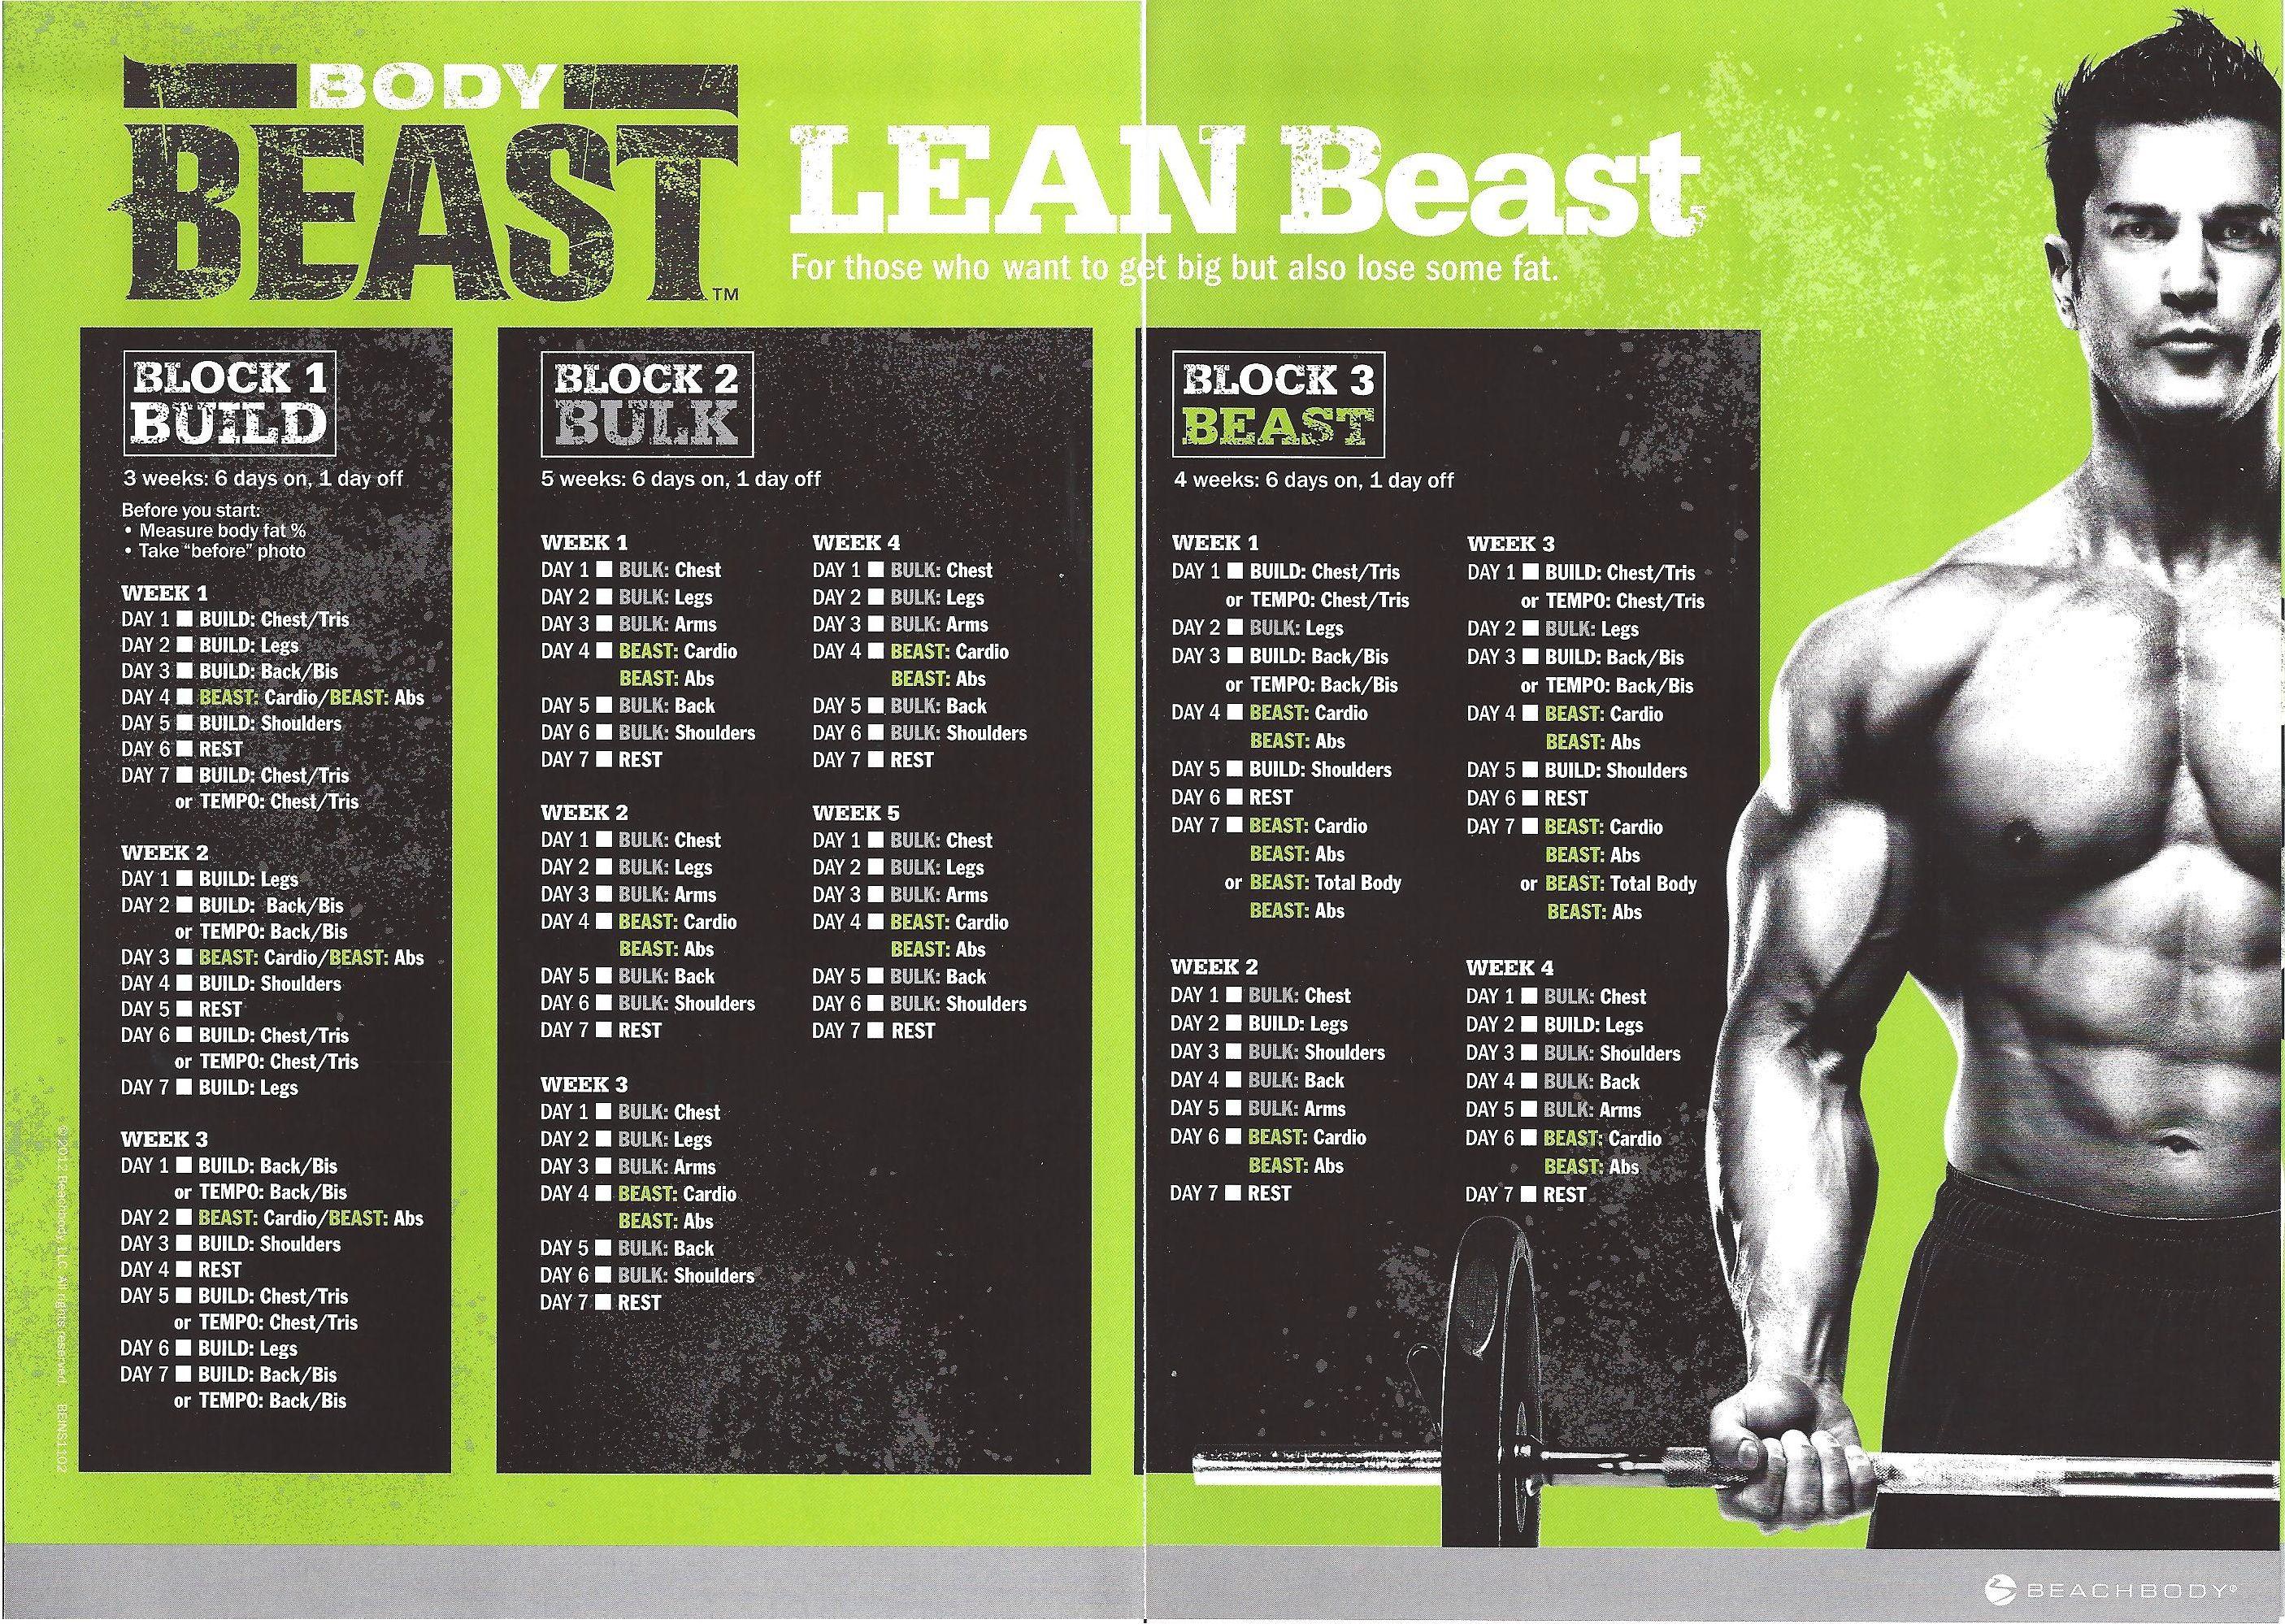 Body Beast Workout Review | BodyBeast | Pinterest | Body beast ...